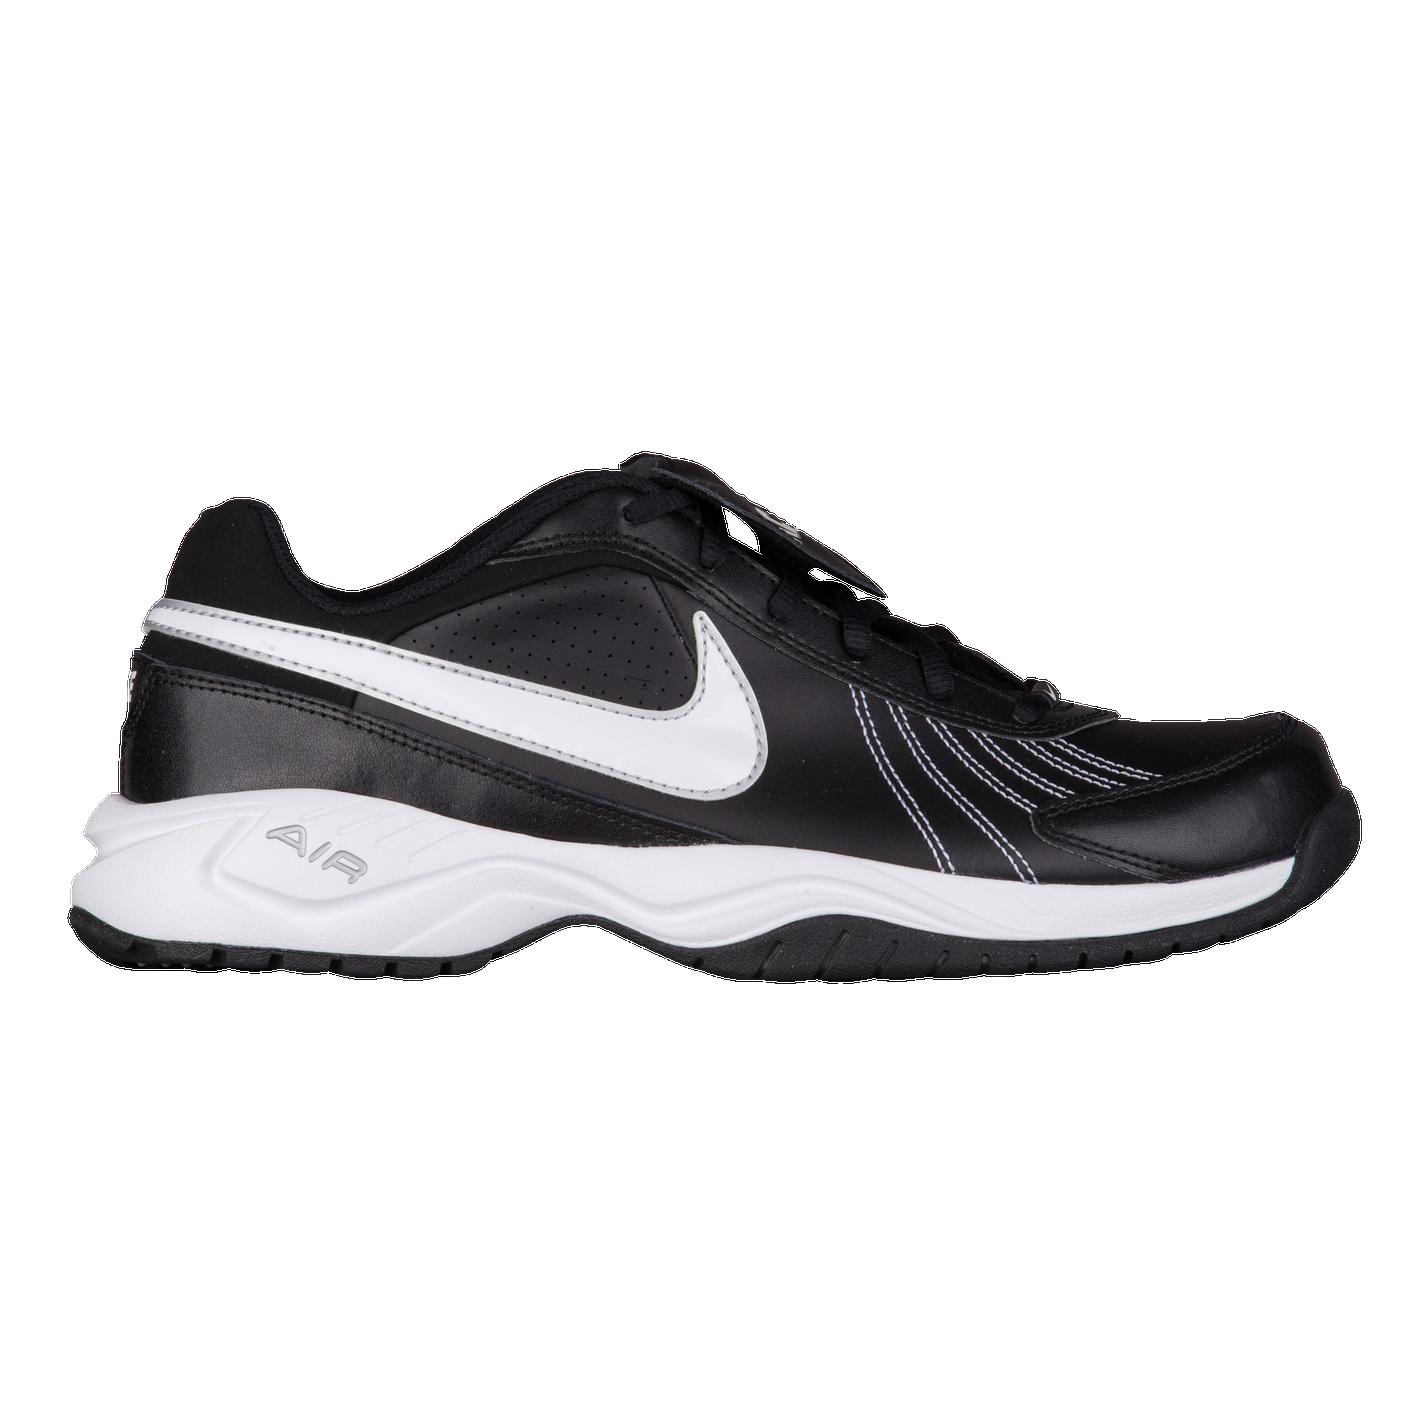 Nike Air Diamond Trainer - Men s - Baseball - Shoes - Black White 12765642e